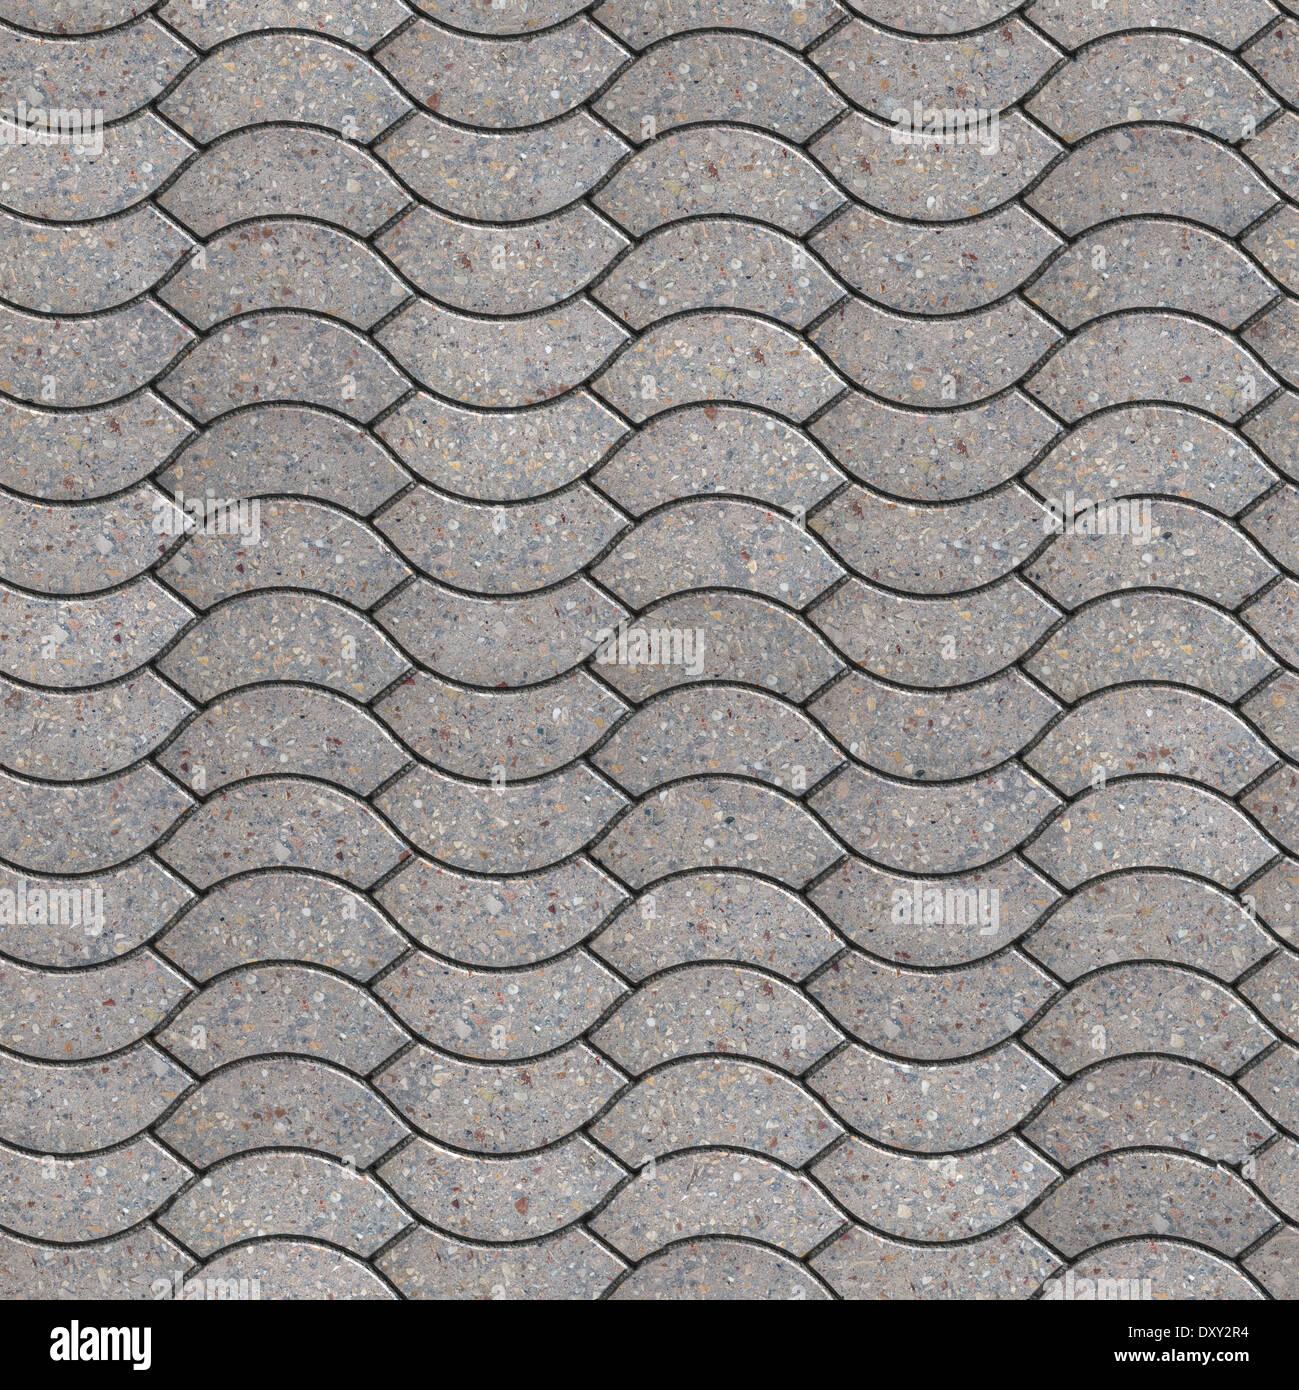 paving slabs seamless tileable texture stock photo 68207080 alamy